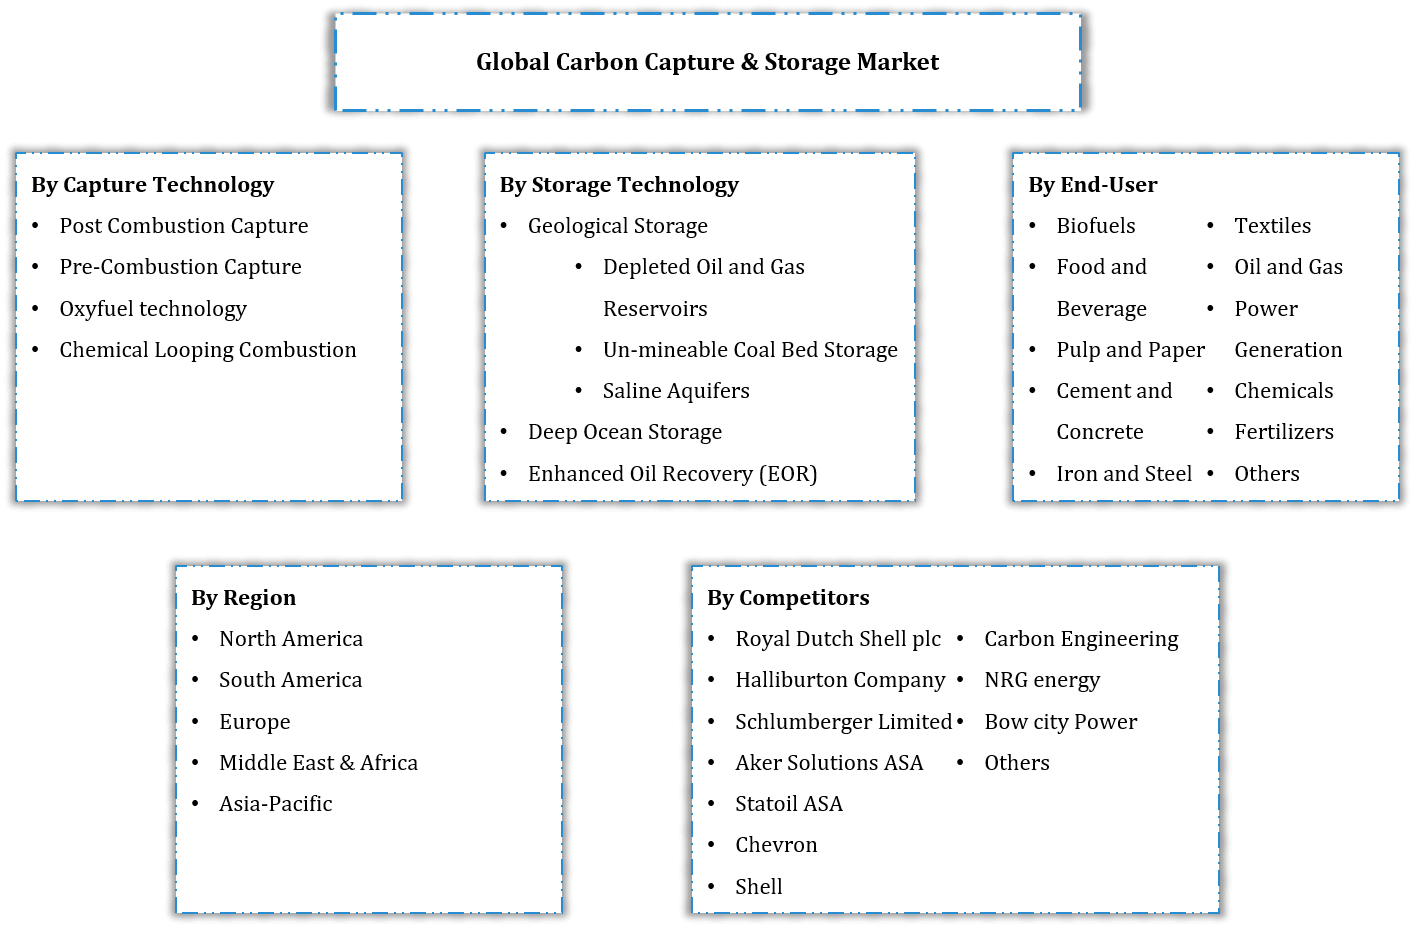 Global Carbon Capture & Storage Market Segmentation